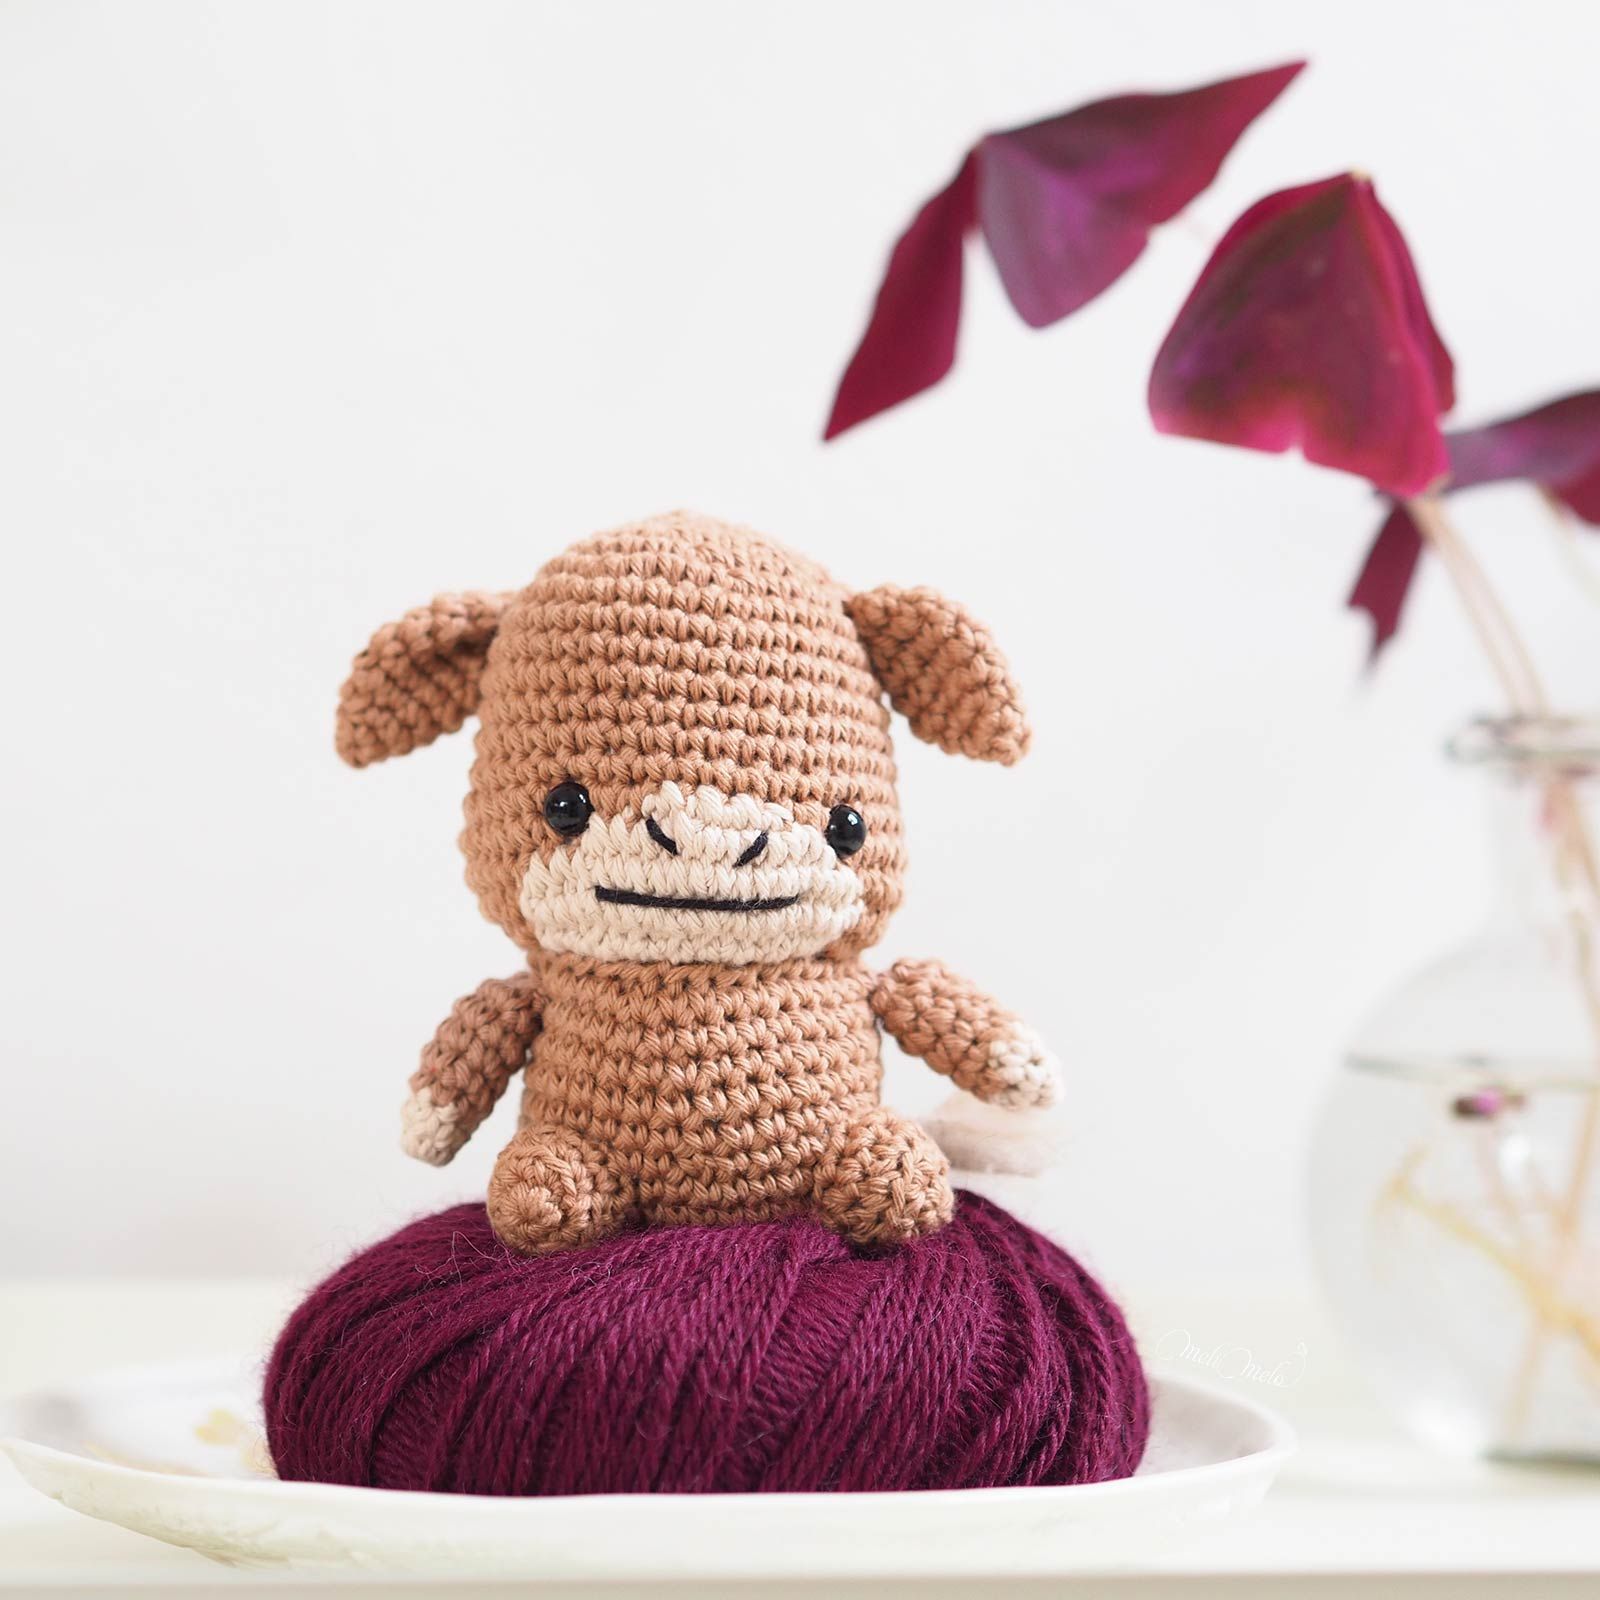 gobba-golden-ox-crochet-buffle-ricorumi-amigurumi-laboutiquedemelimelo